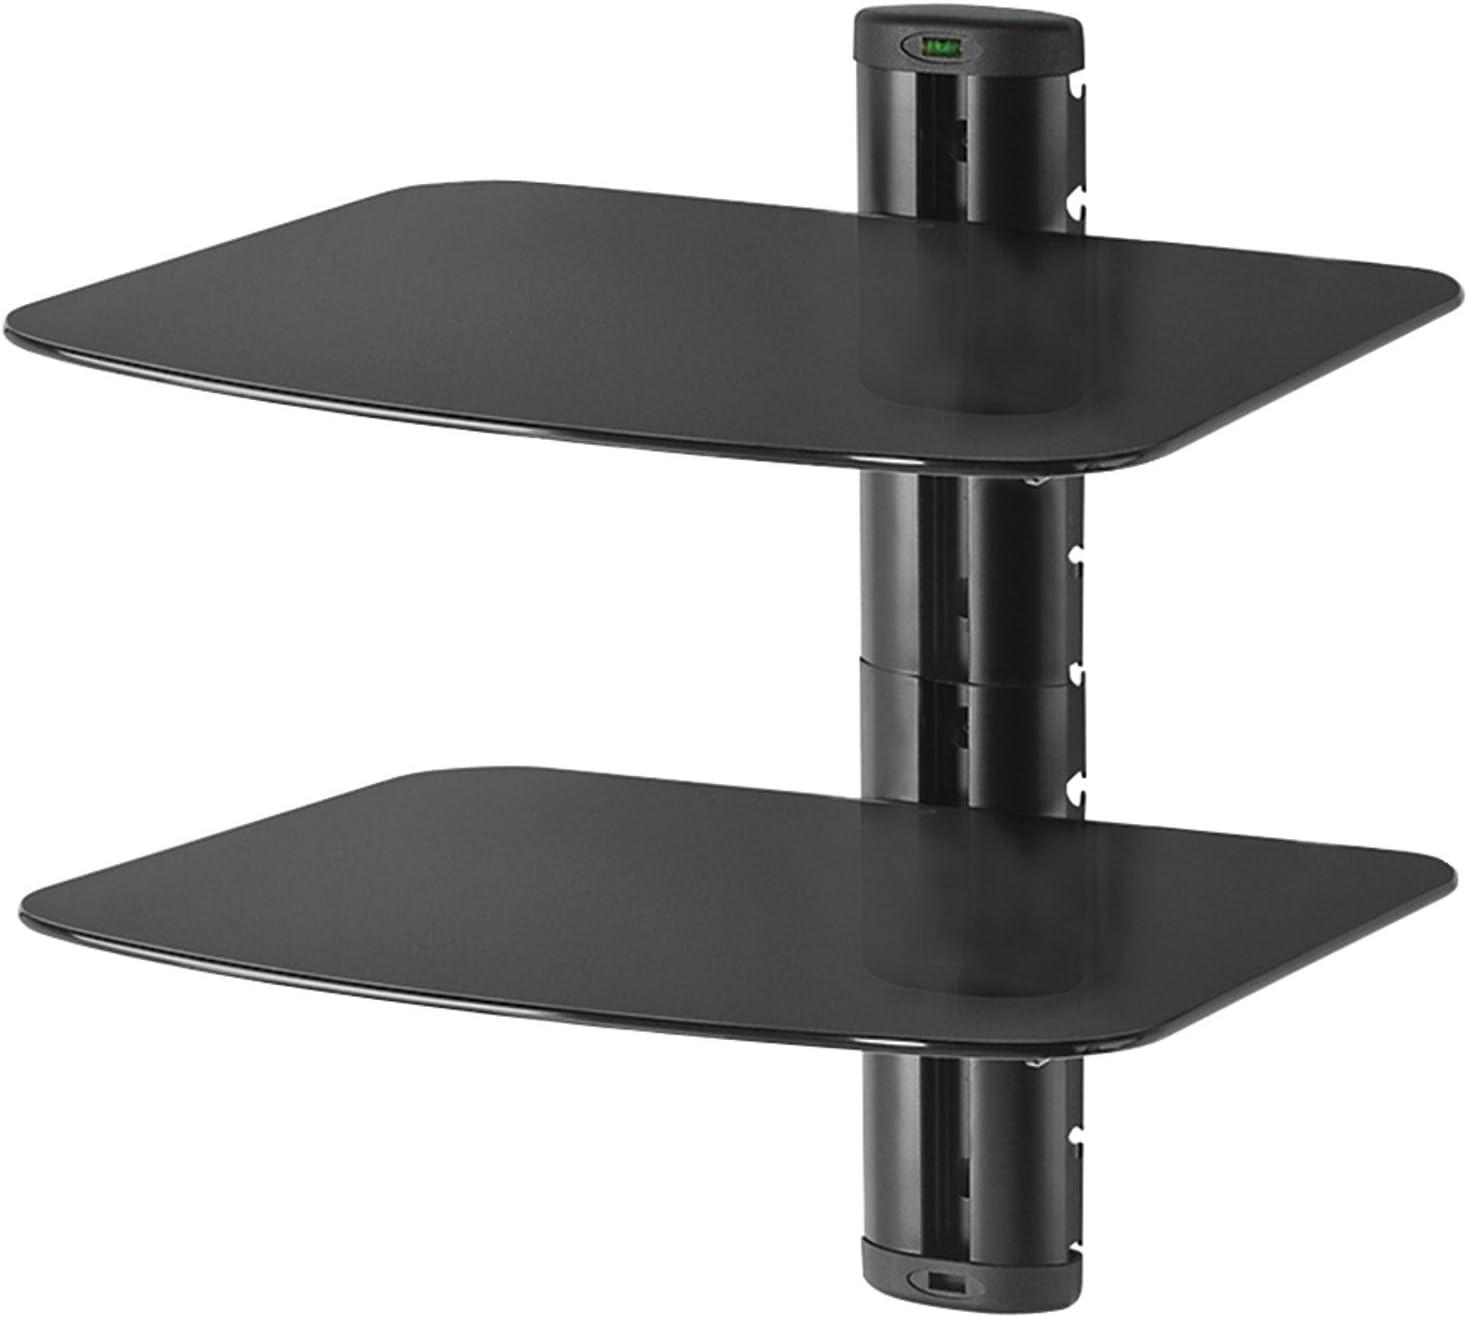 Peerless-AV ESHV30 A V Max 69% OFF Wall List price with Glass Dual Shelf Shelves